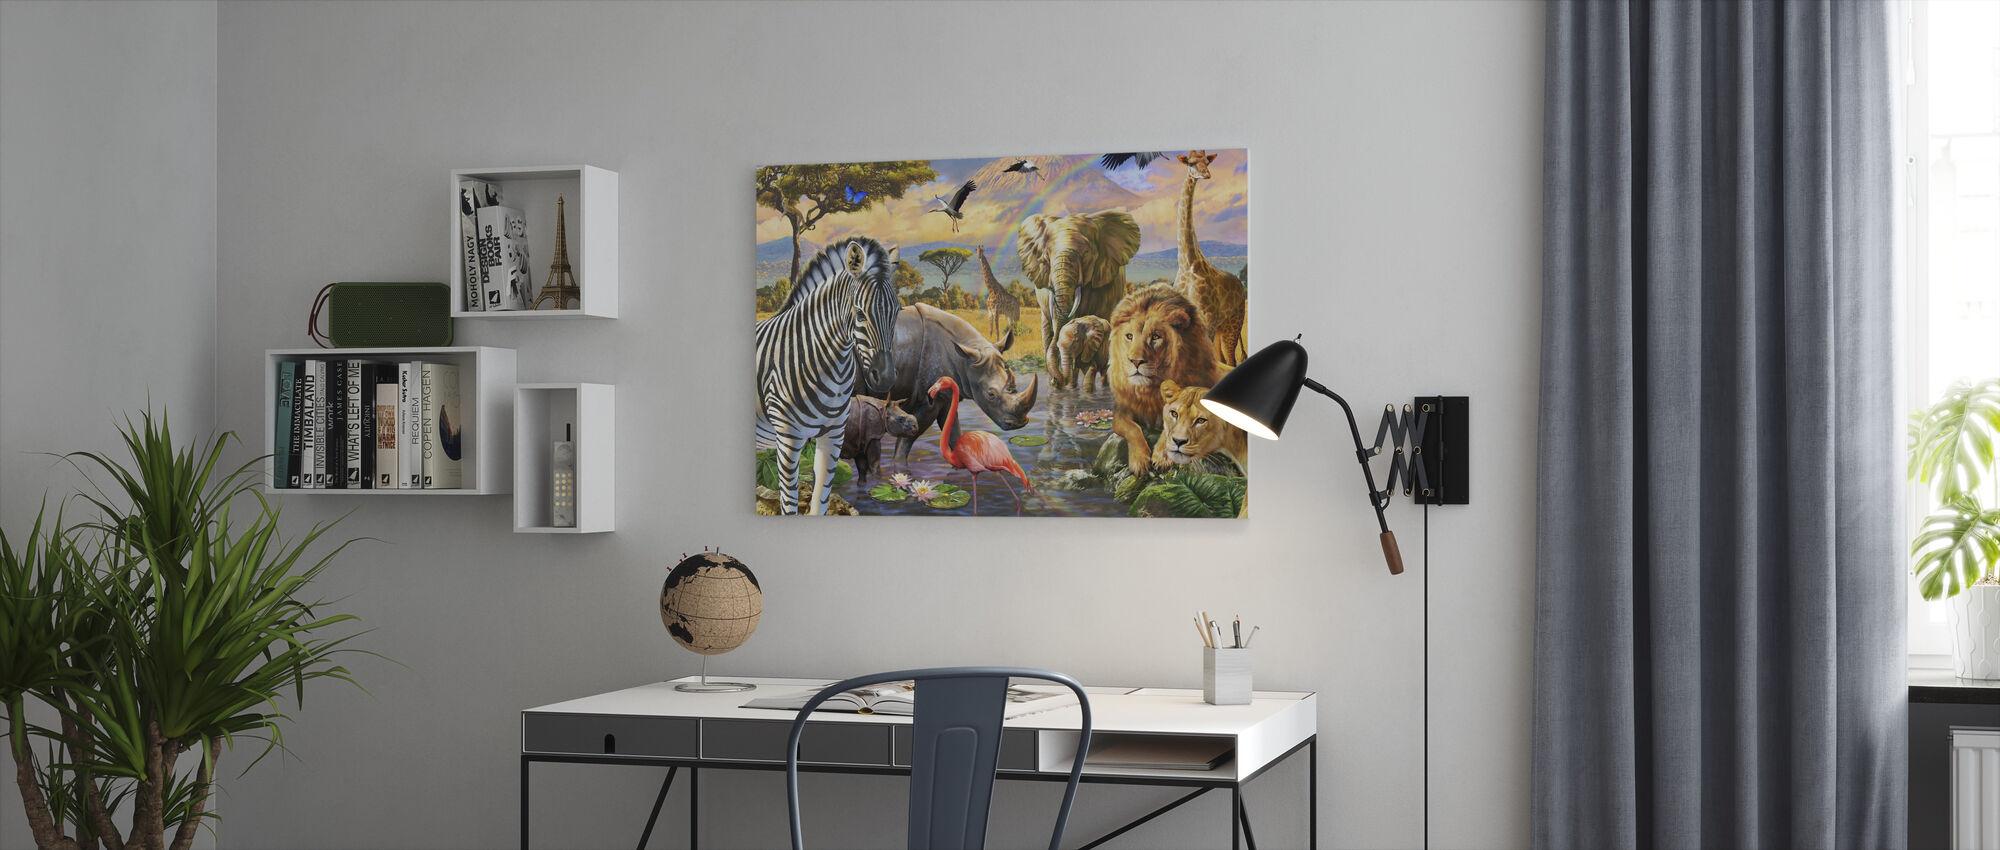 Savanna Vattningshål - Canvastavla - Kontor